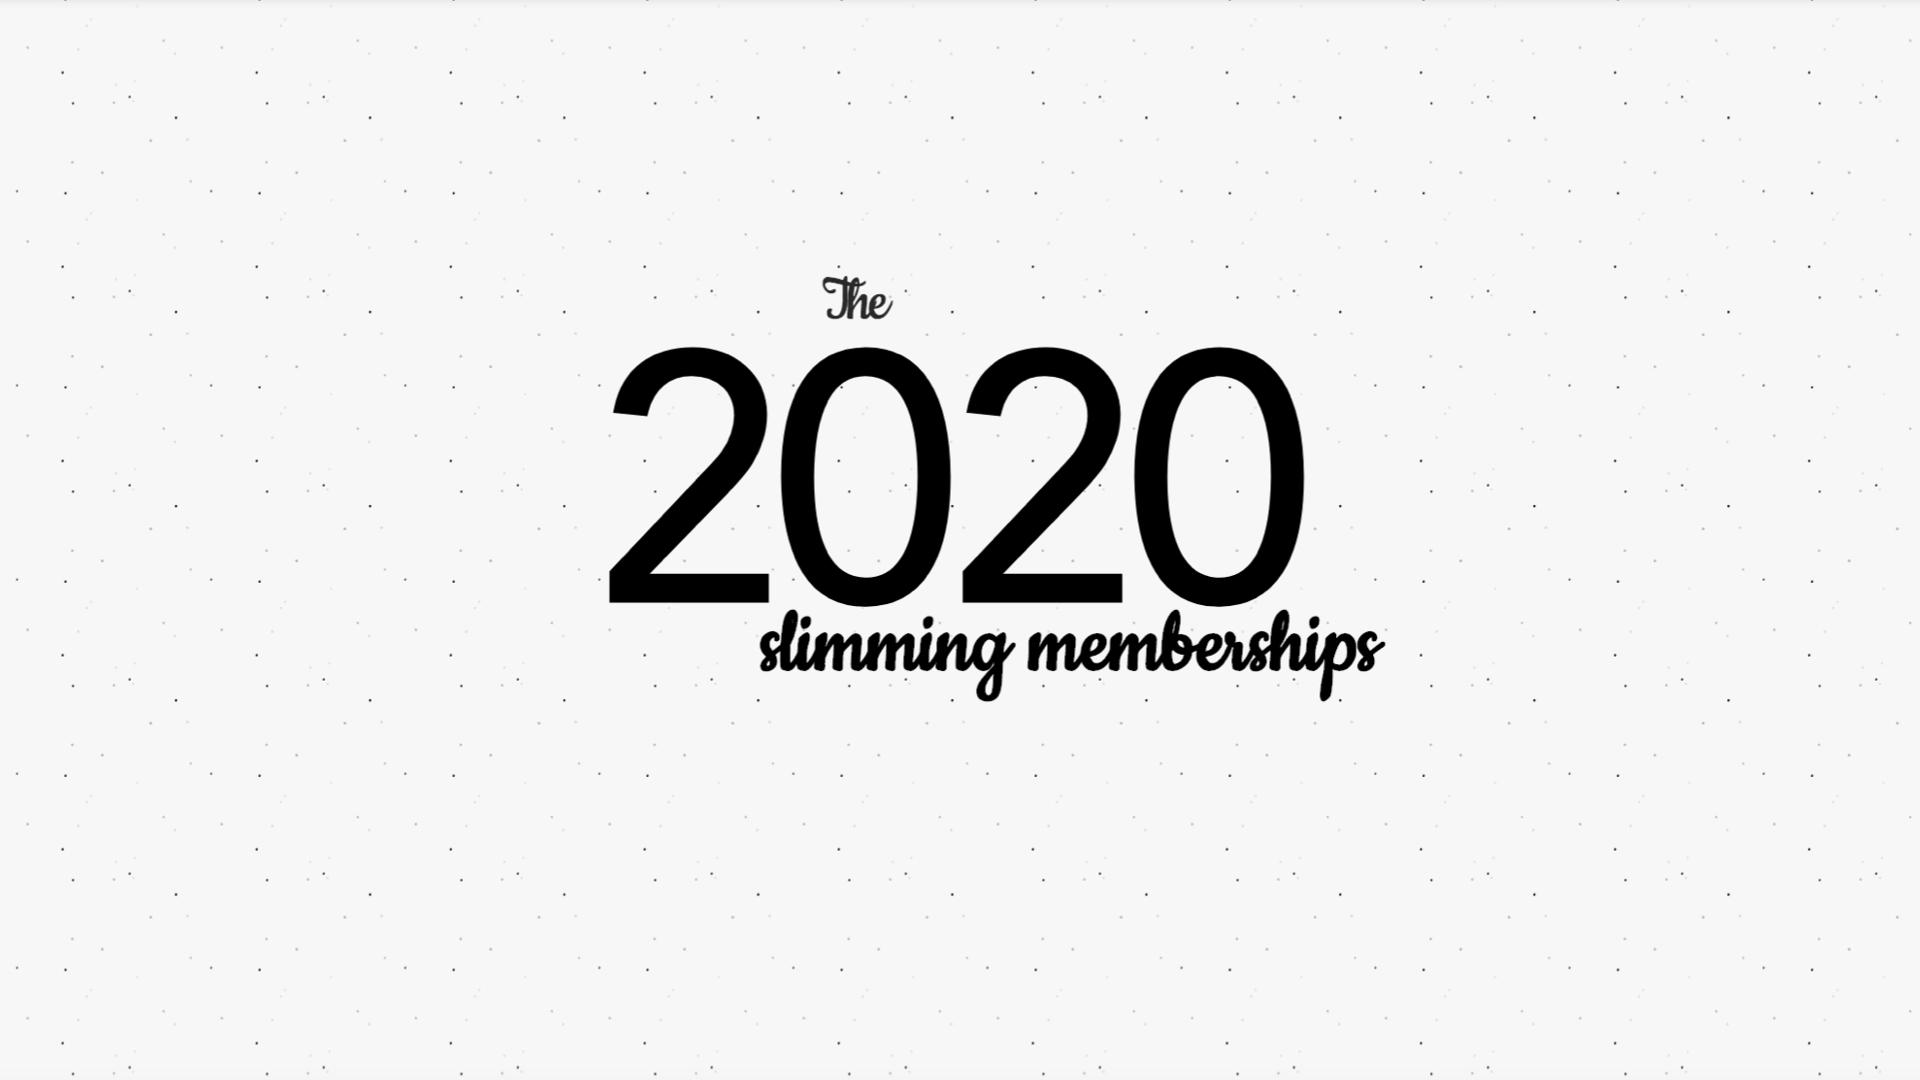 2020 slimming img.001